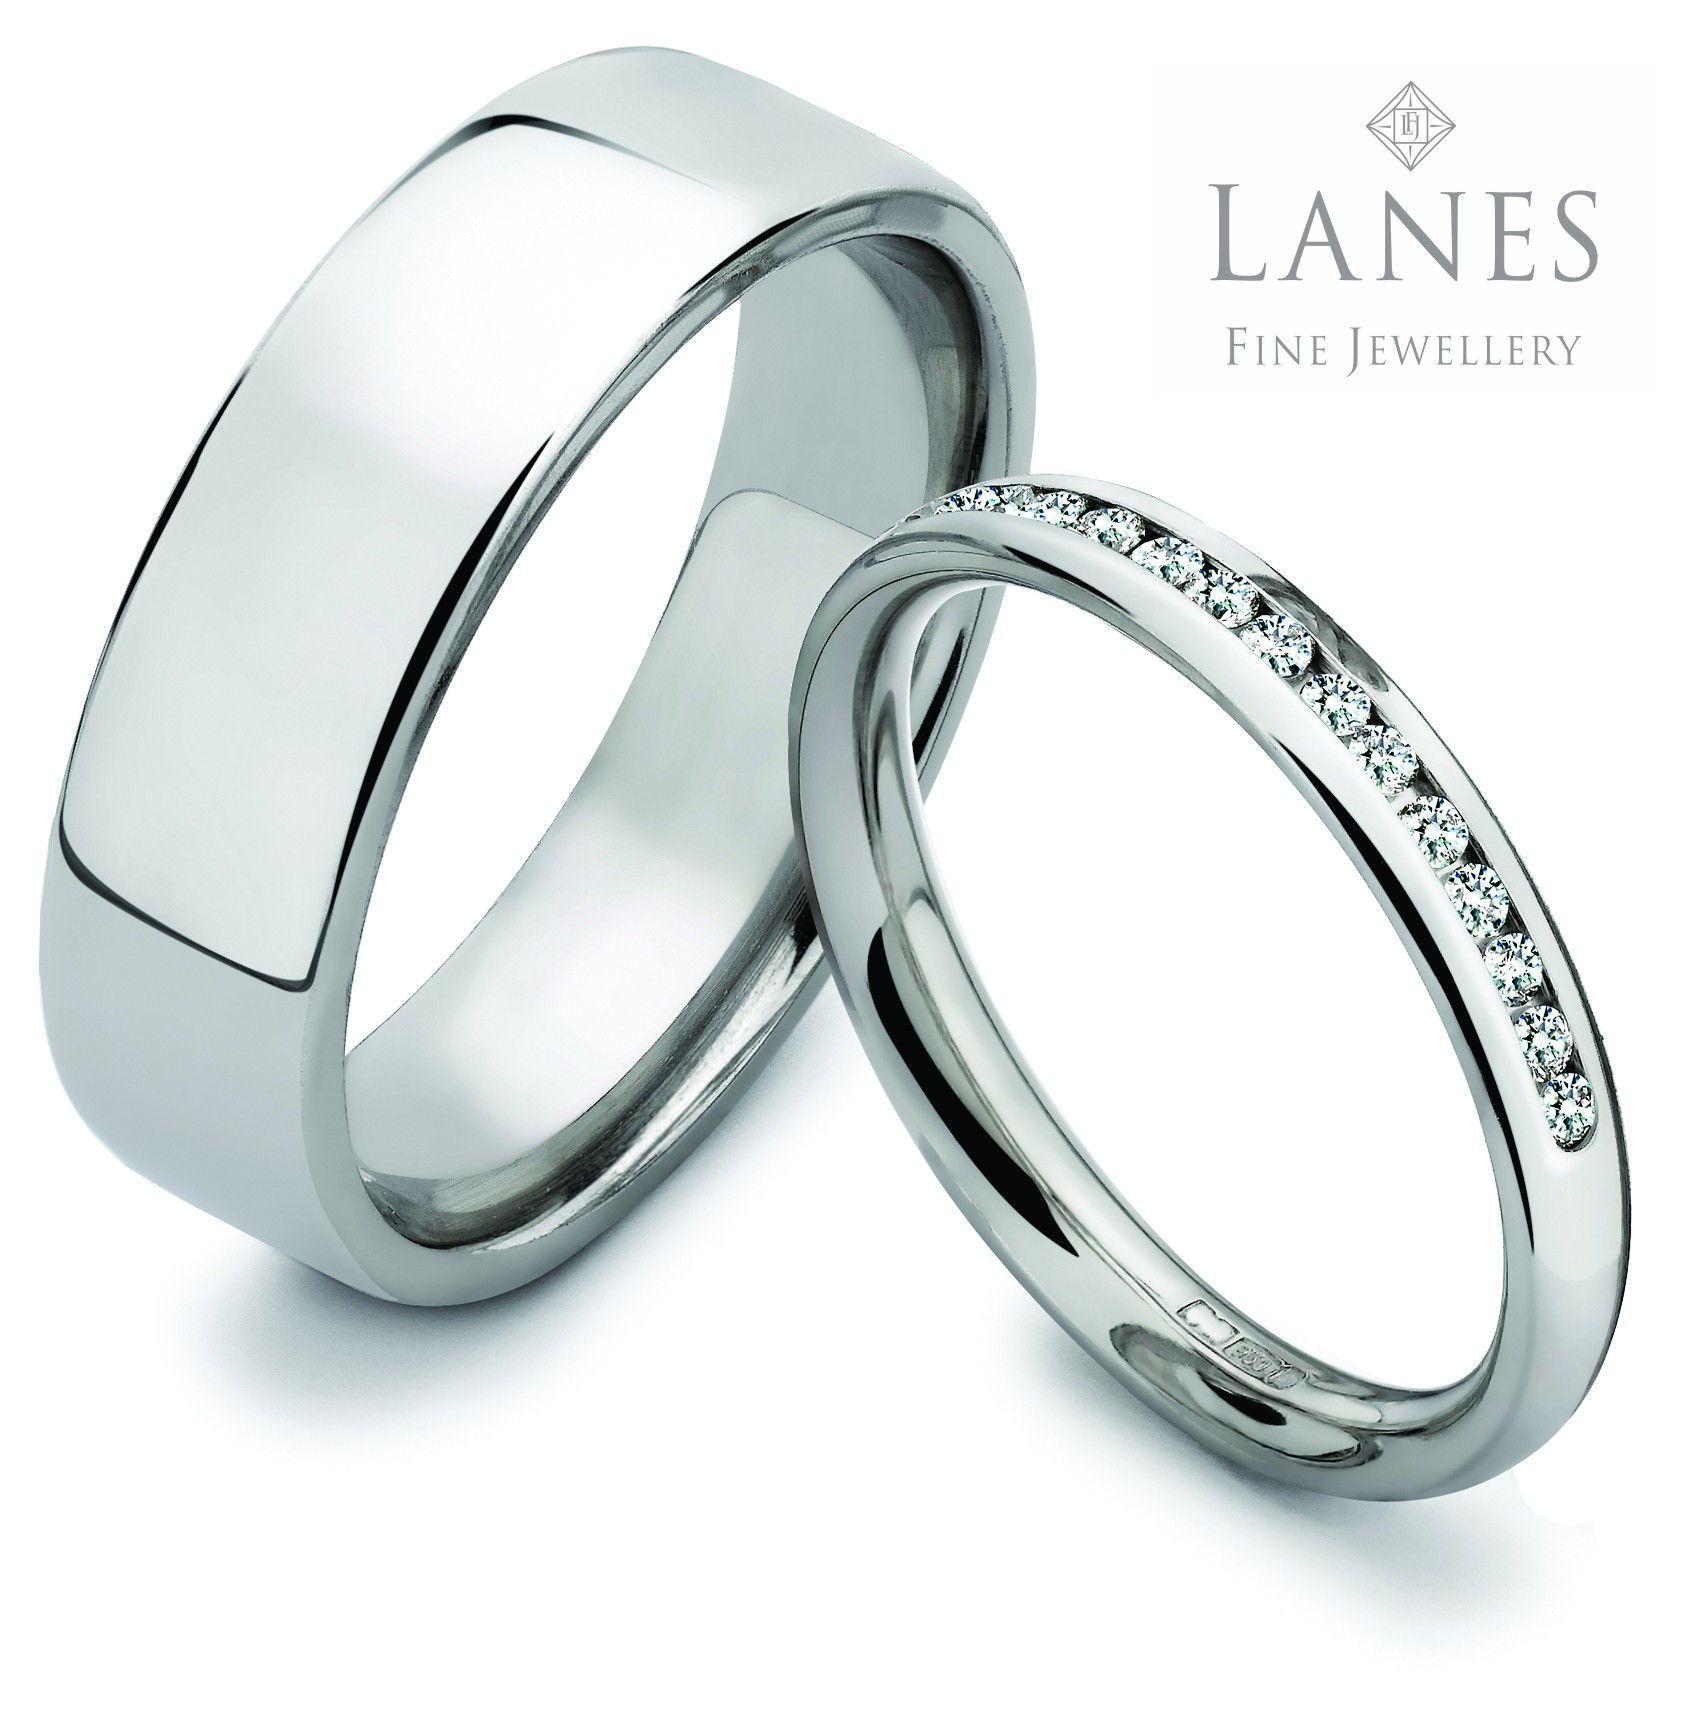 Platinum Wedding Rings Simple Elegant Design Diamond Set For The Lady See